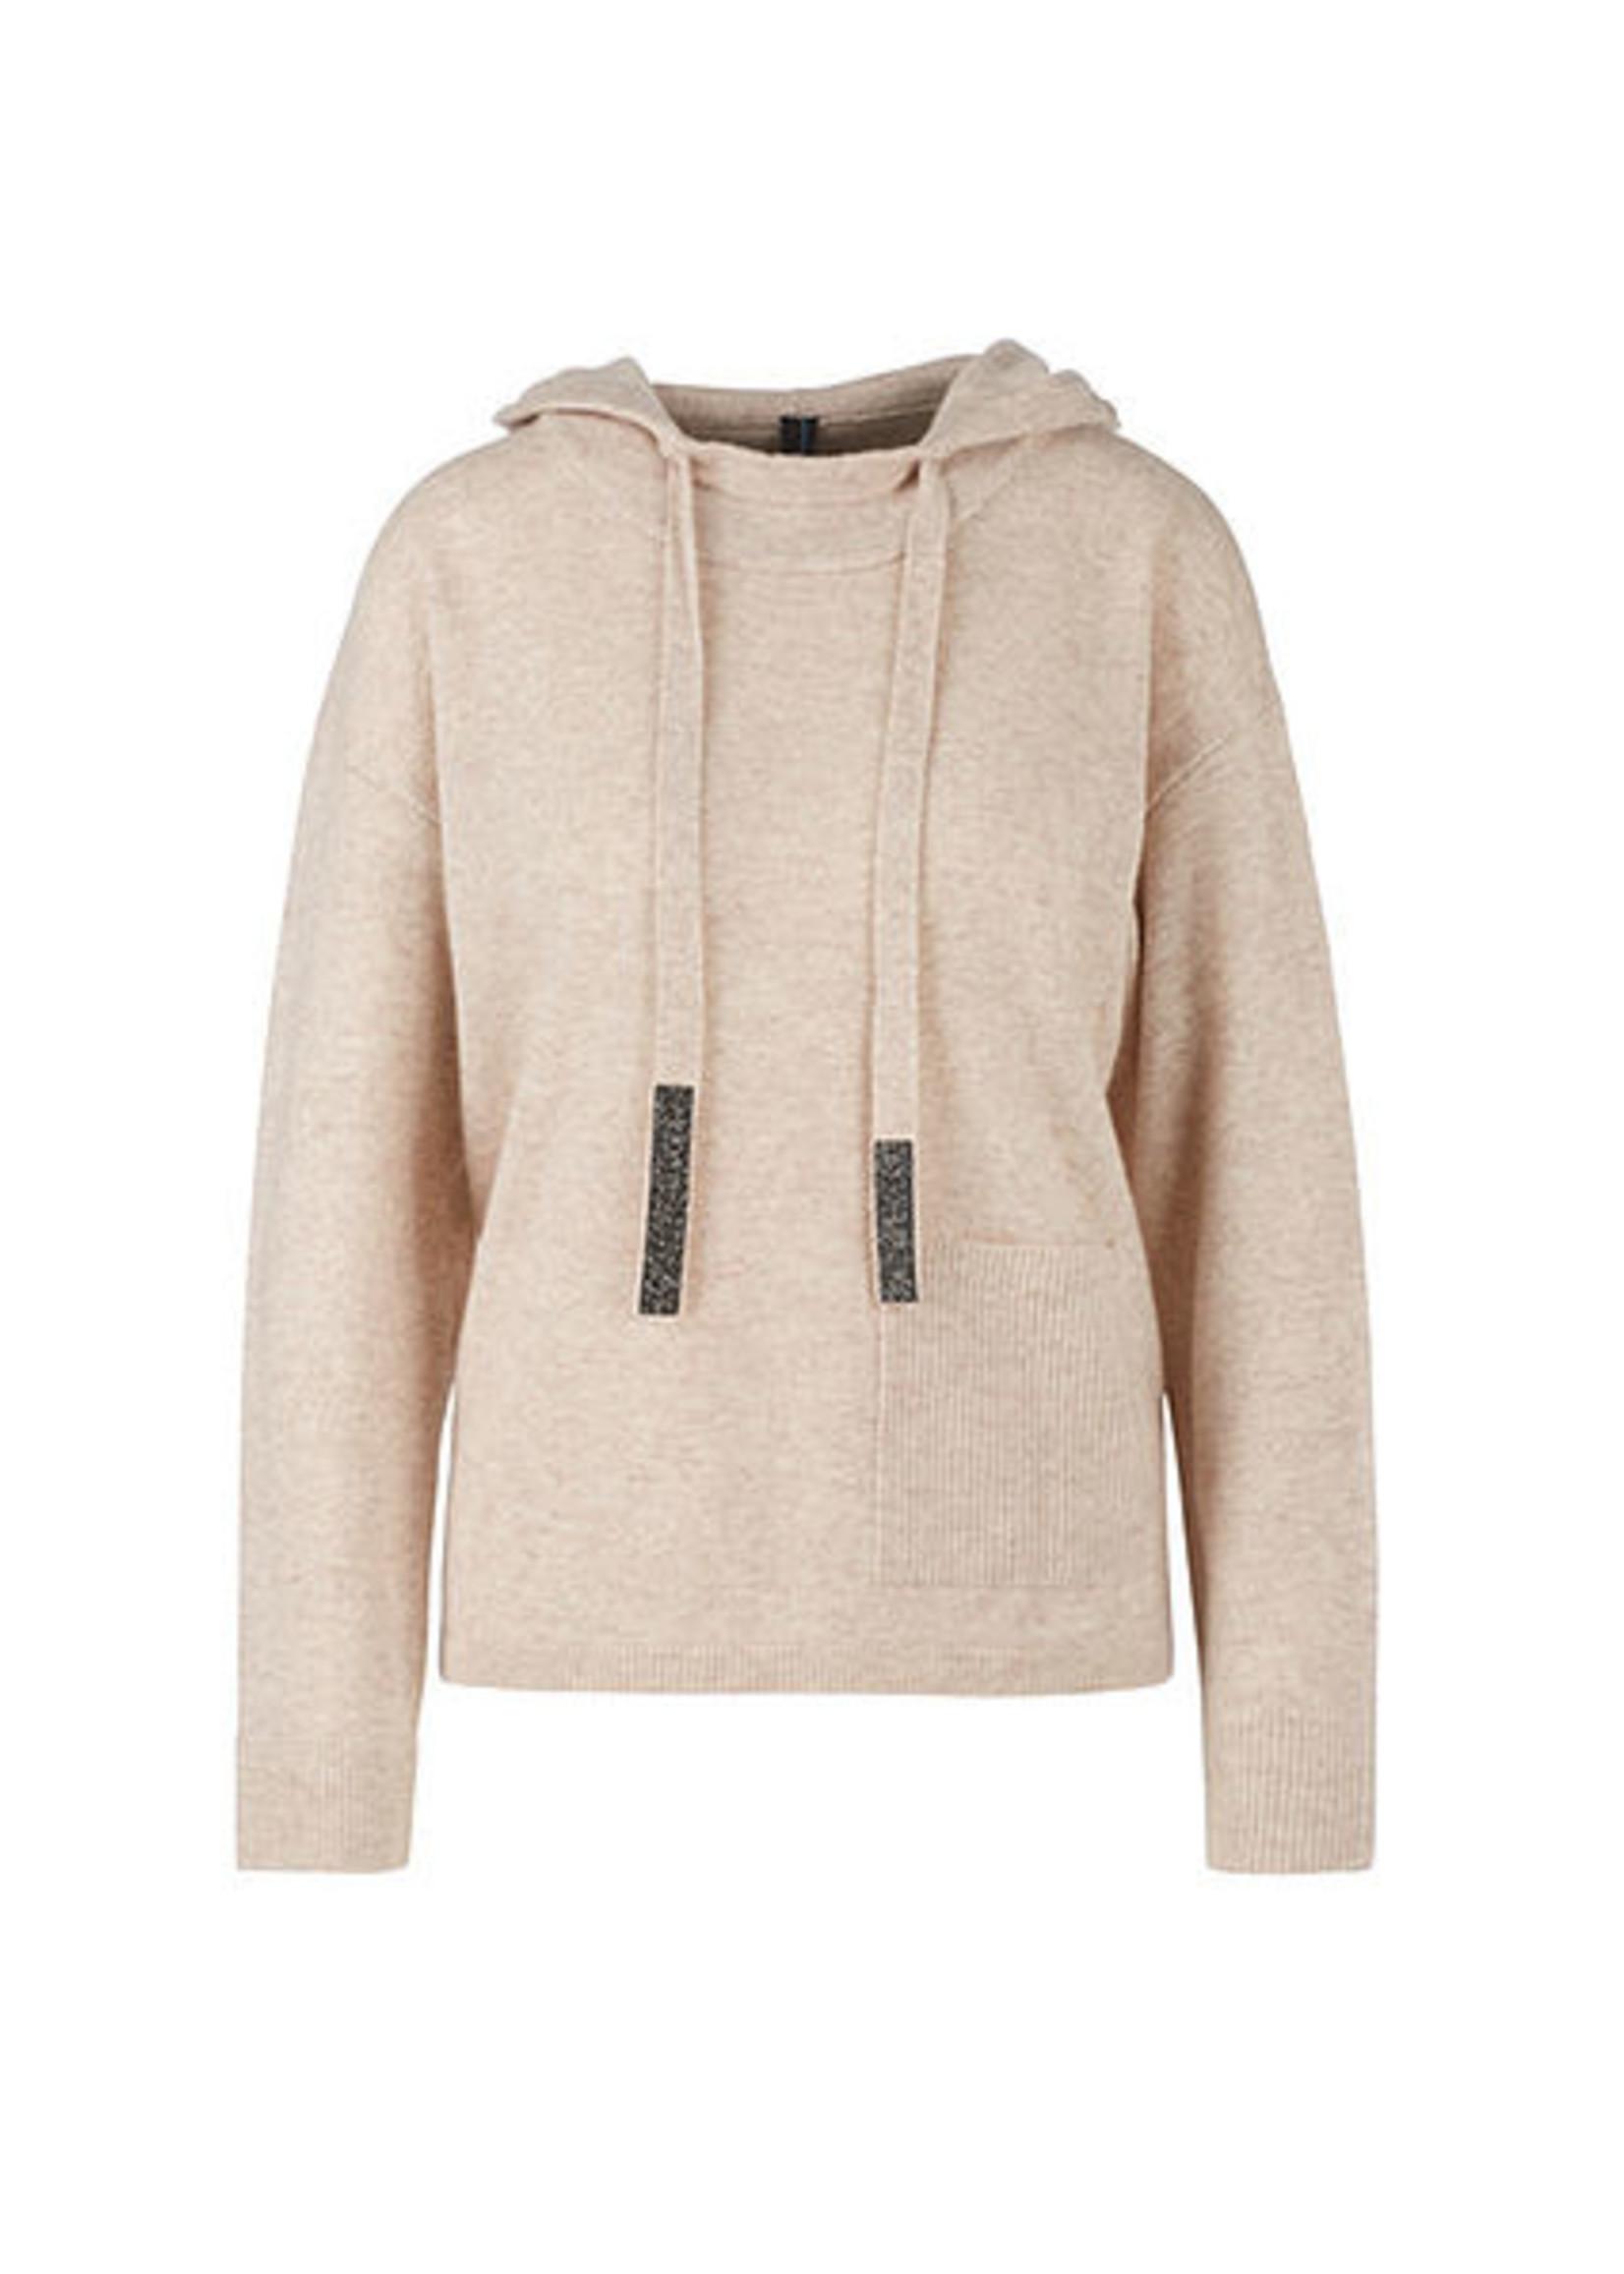 Sweater RA 41.12 M84 bisque